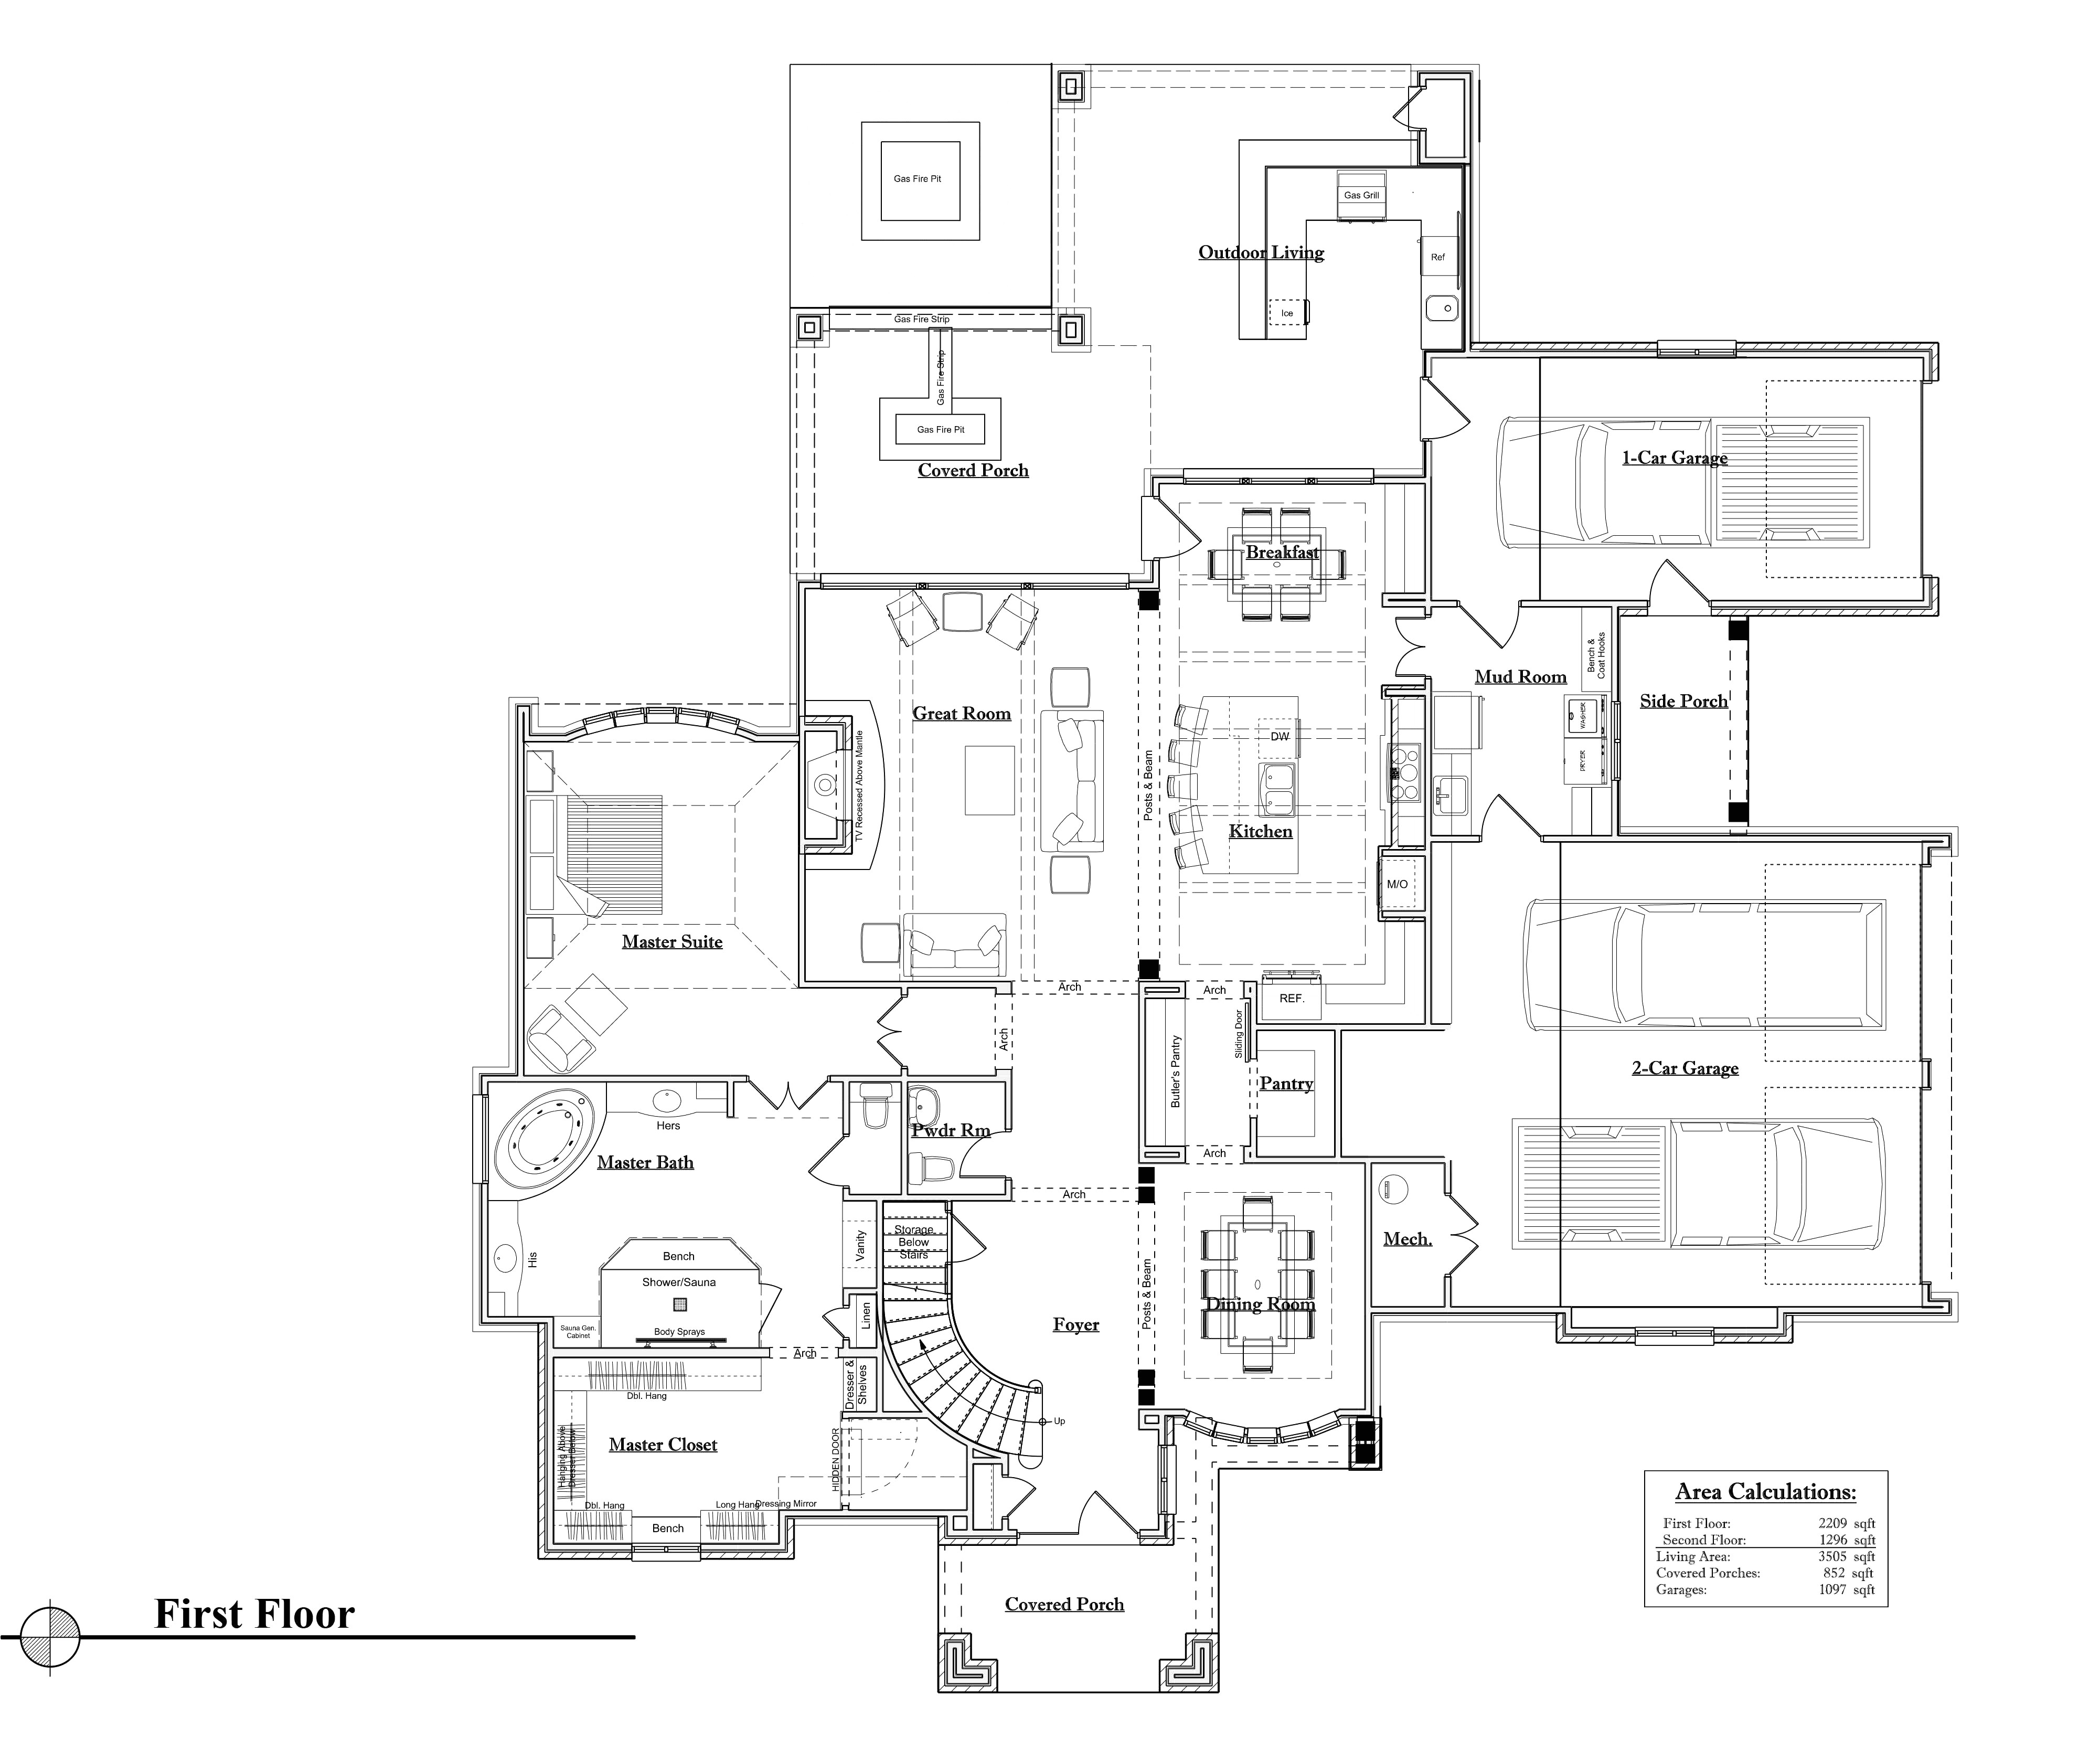 floor plan creator windows 10